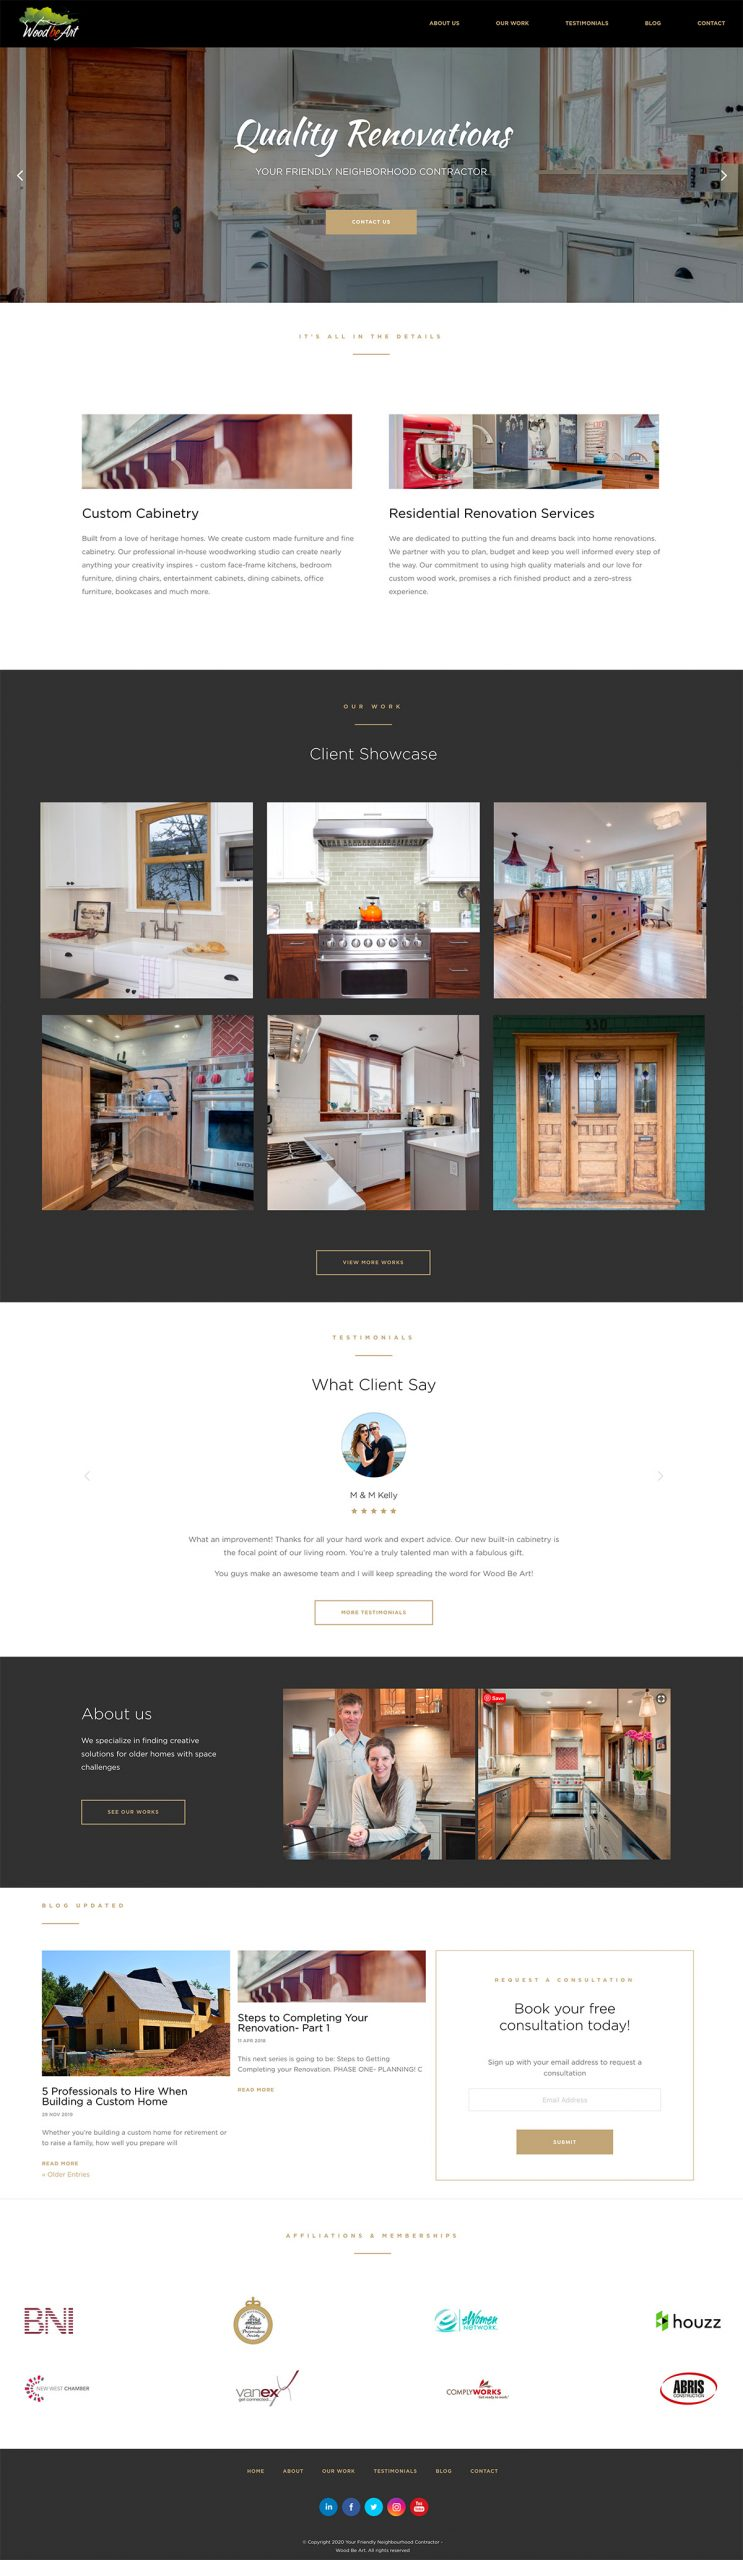 wood-be-art-website